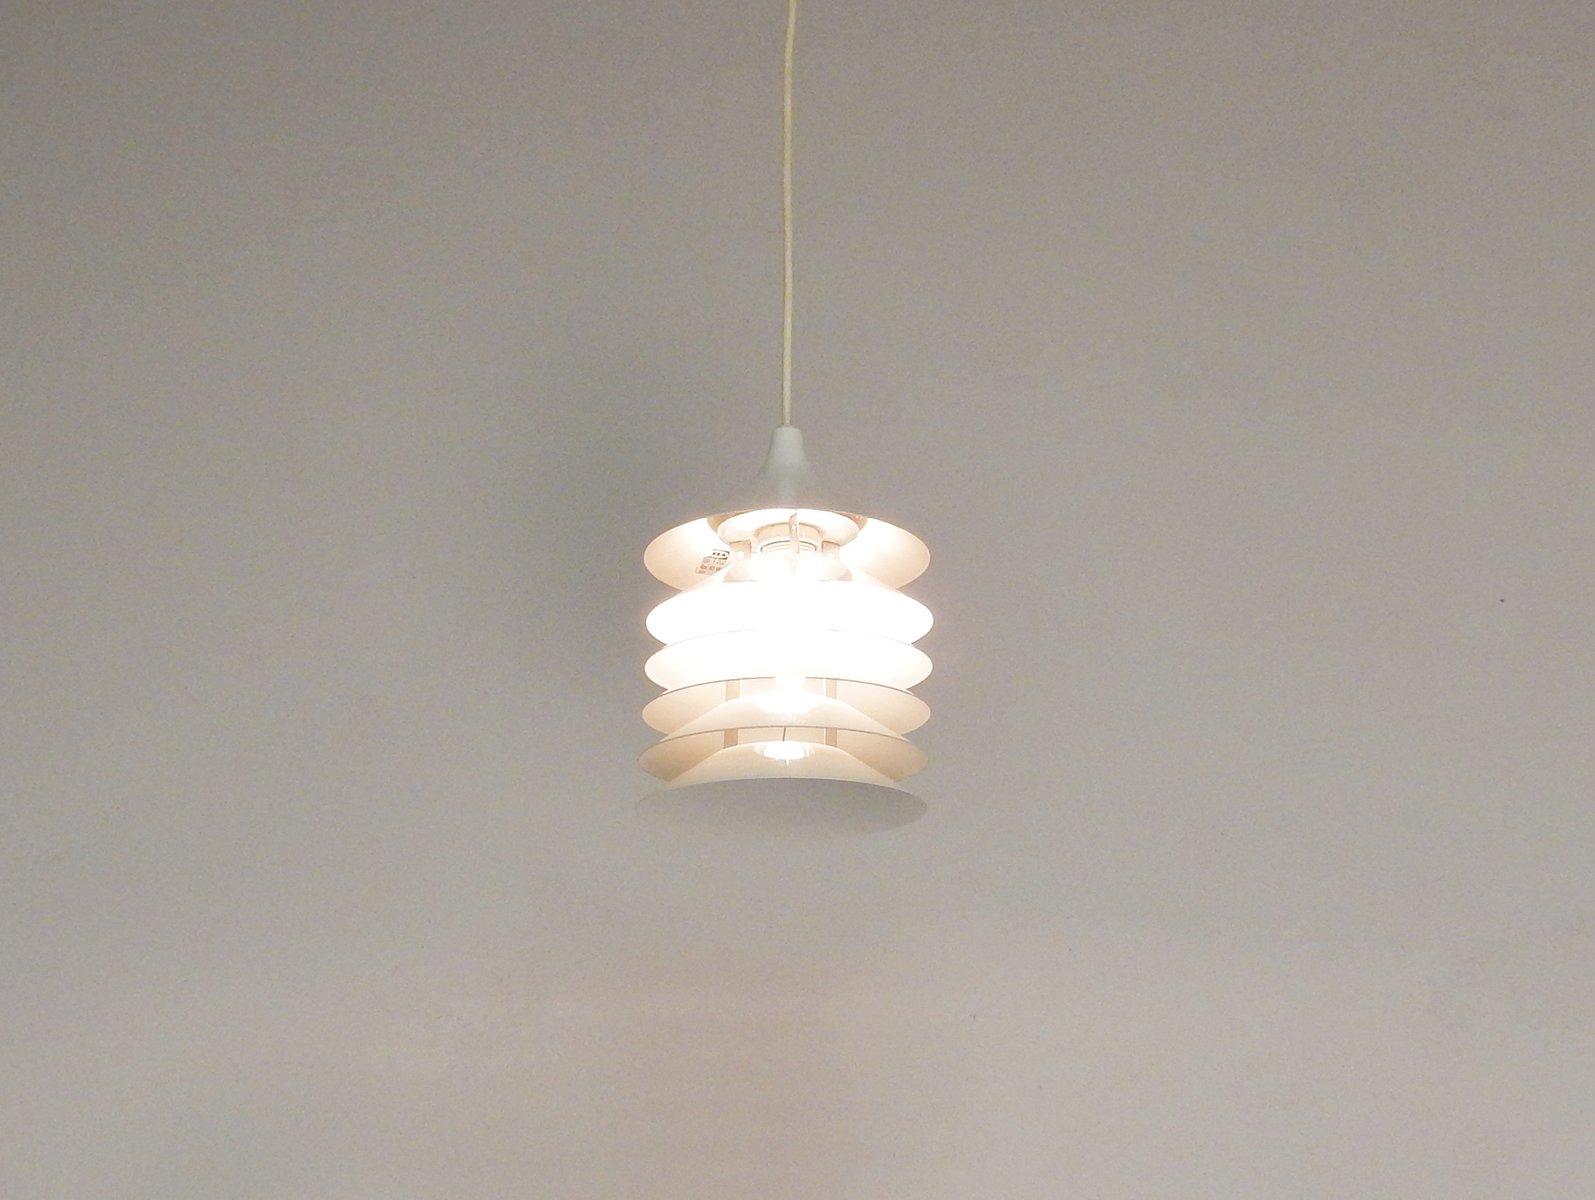 Ikea Lampe Kupfer Weiss Kupferlampe Mag Diy Basteln Kupfer